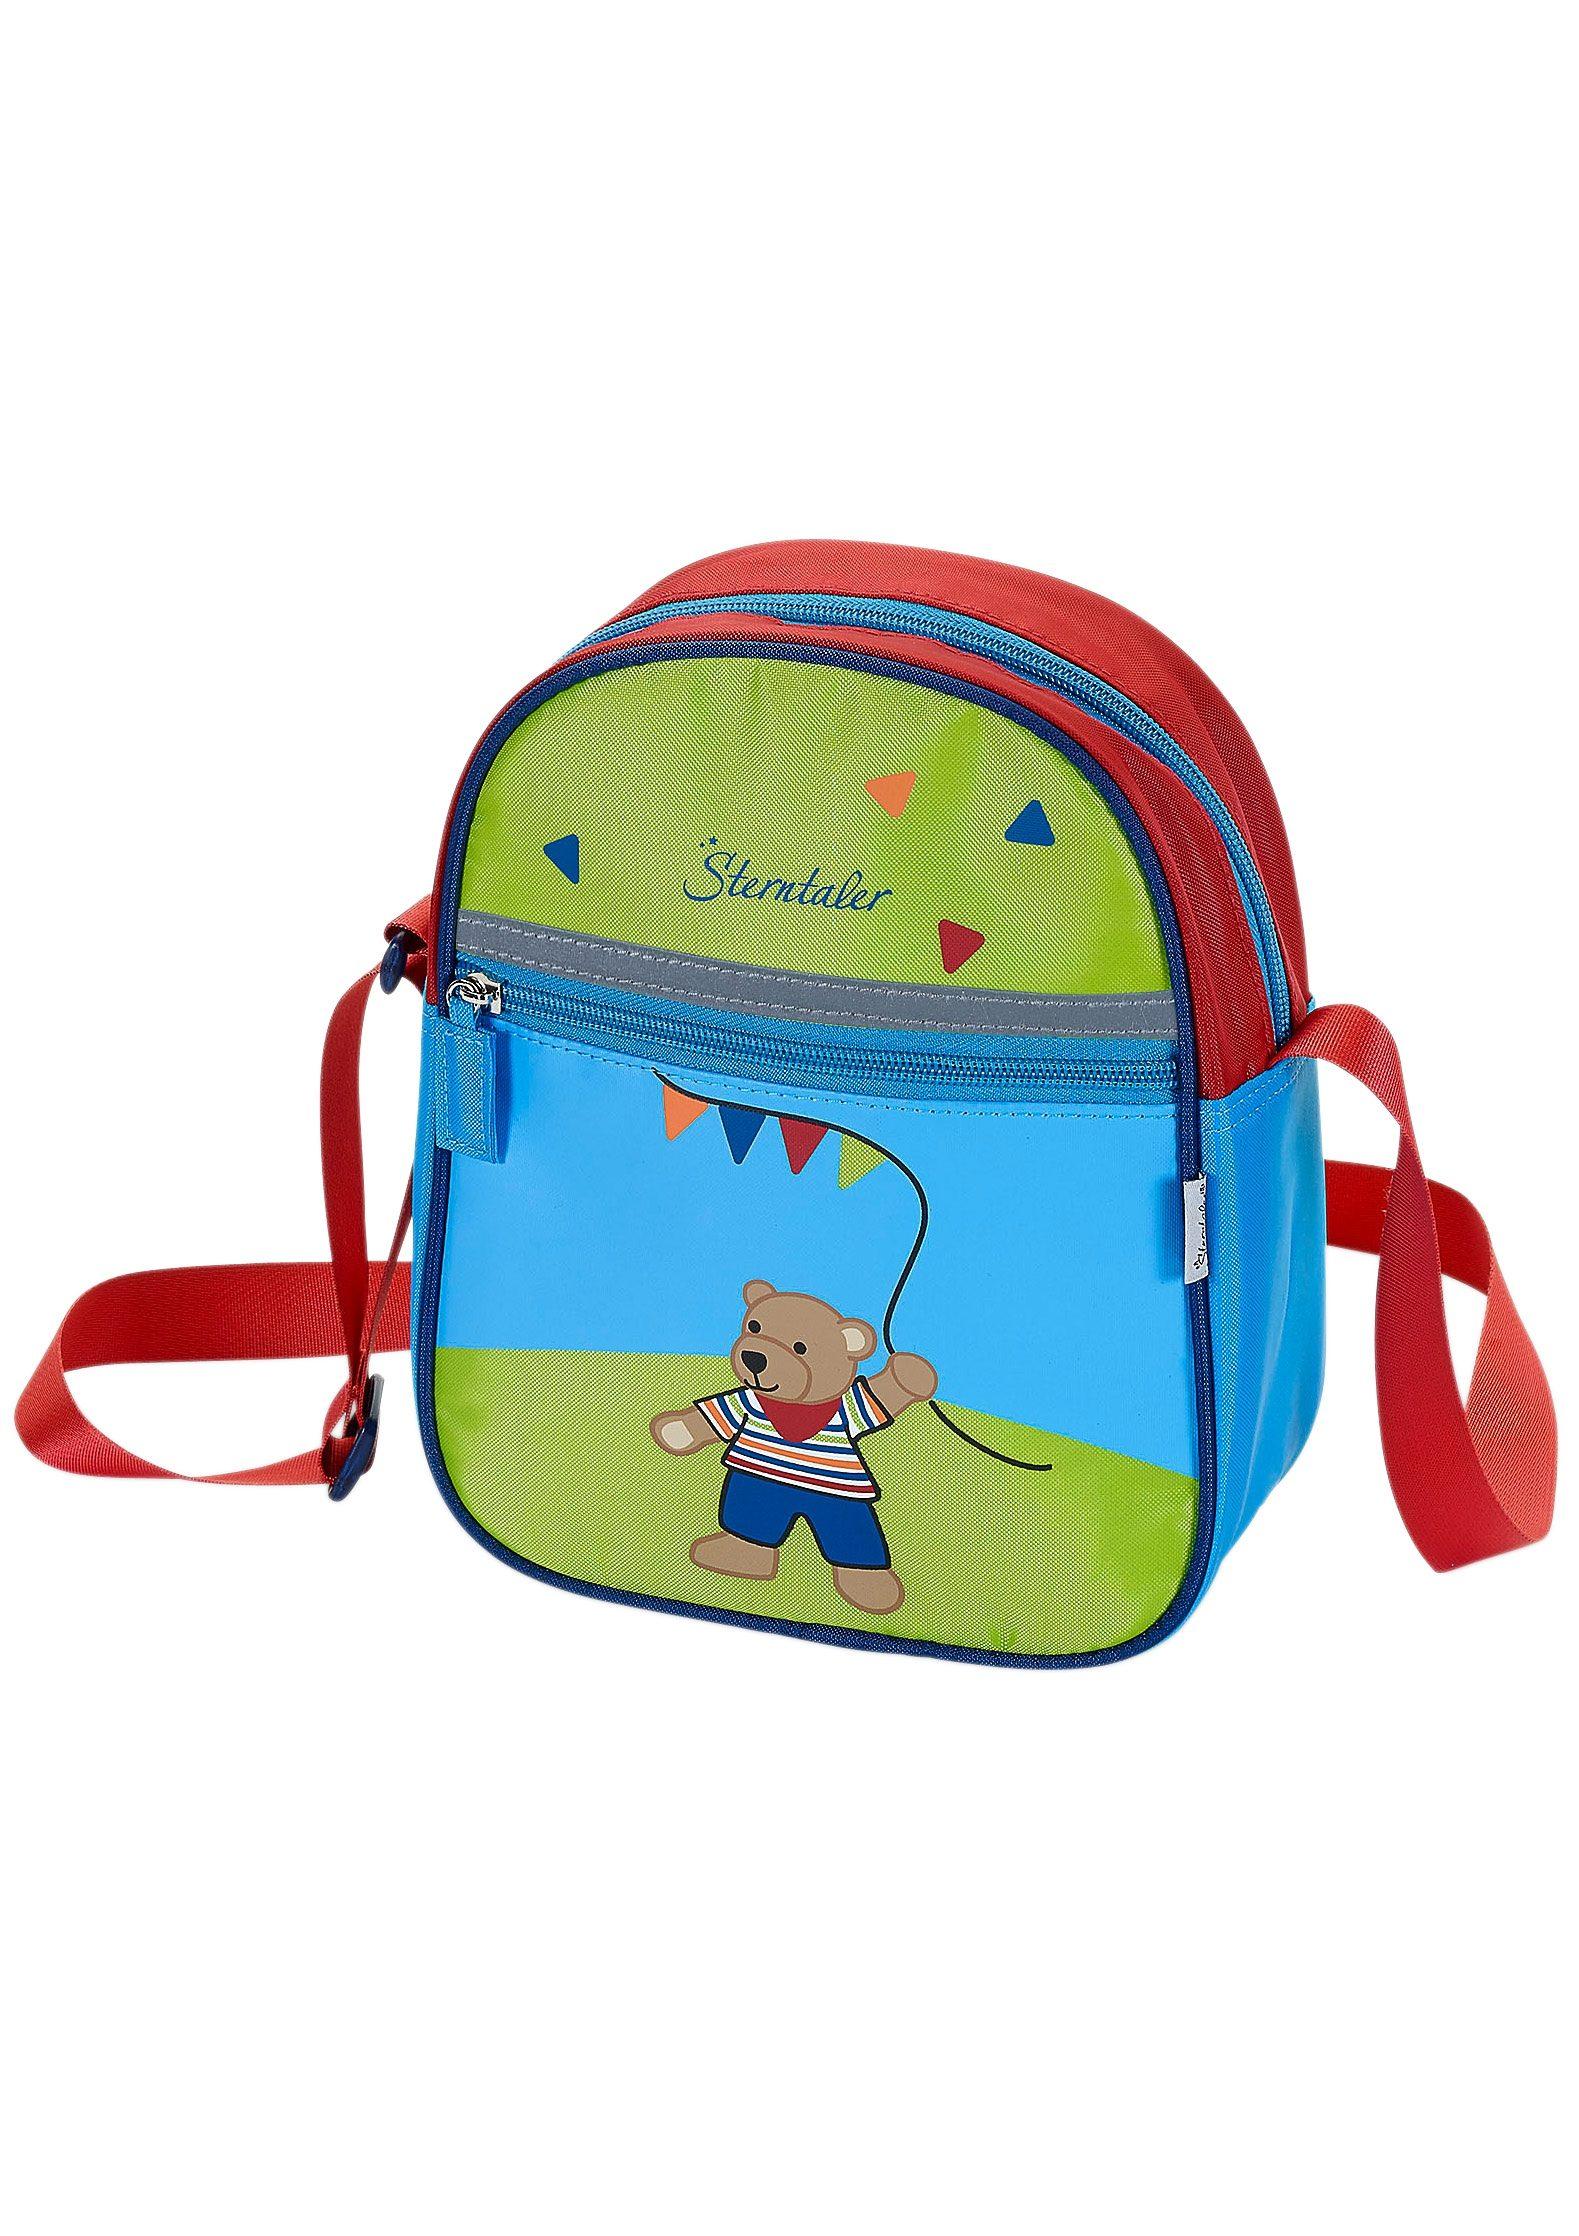 Sterntaler Kindergartentasche, »Ben«